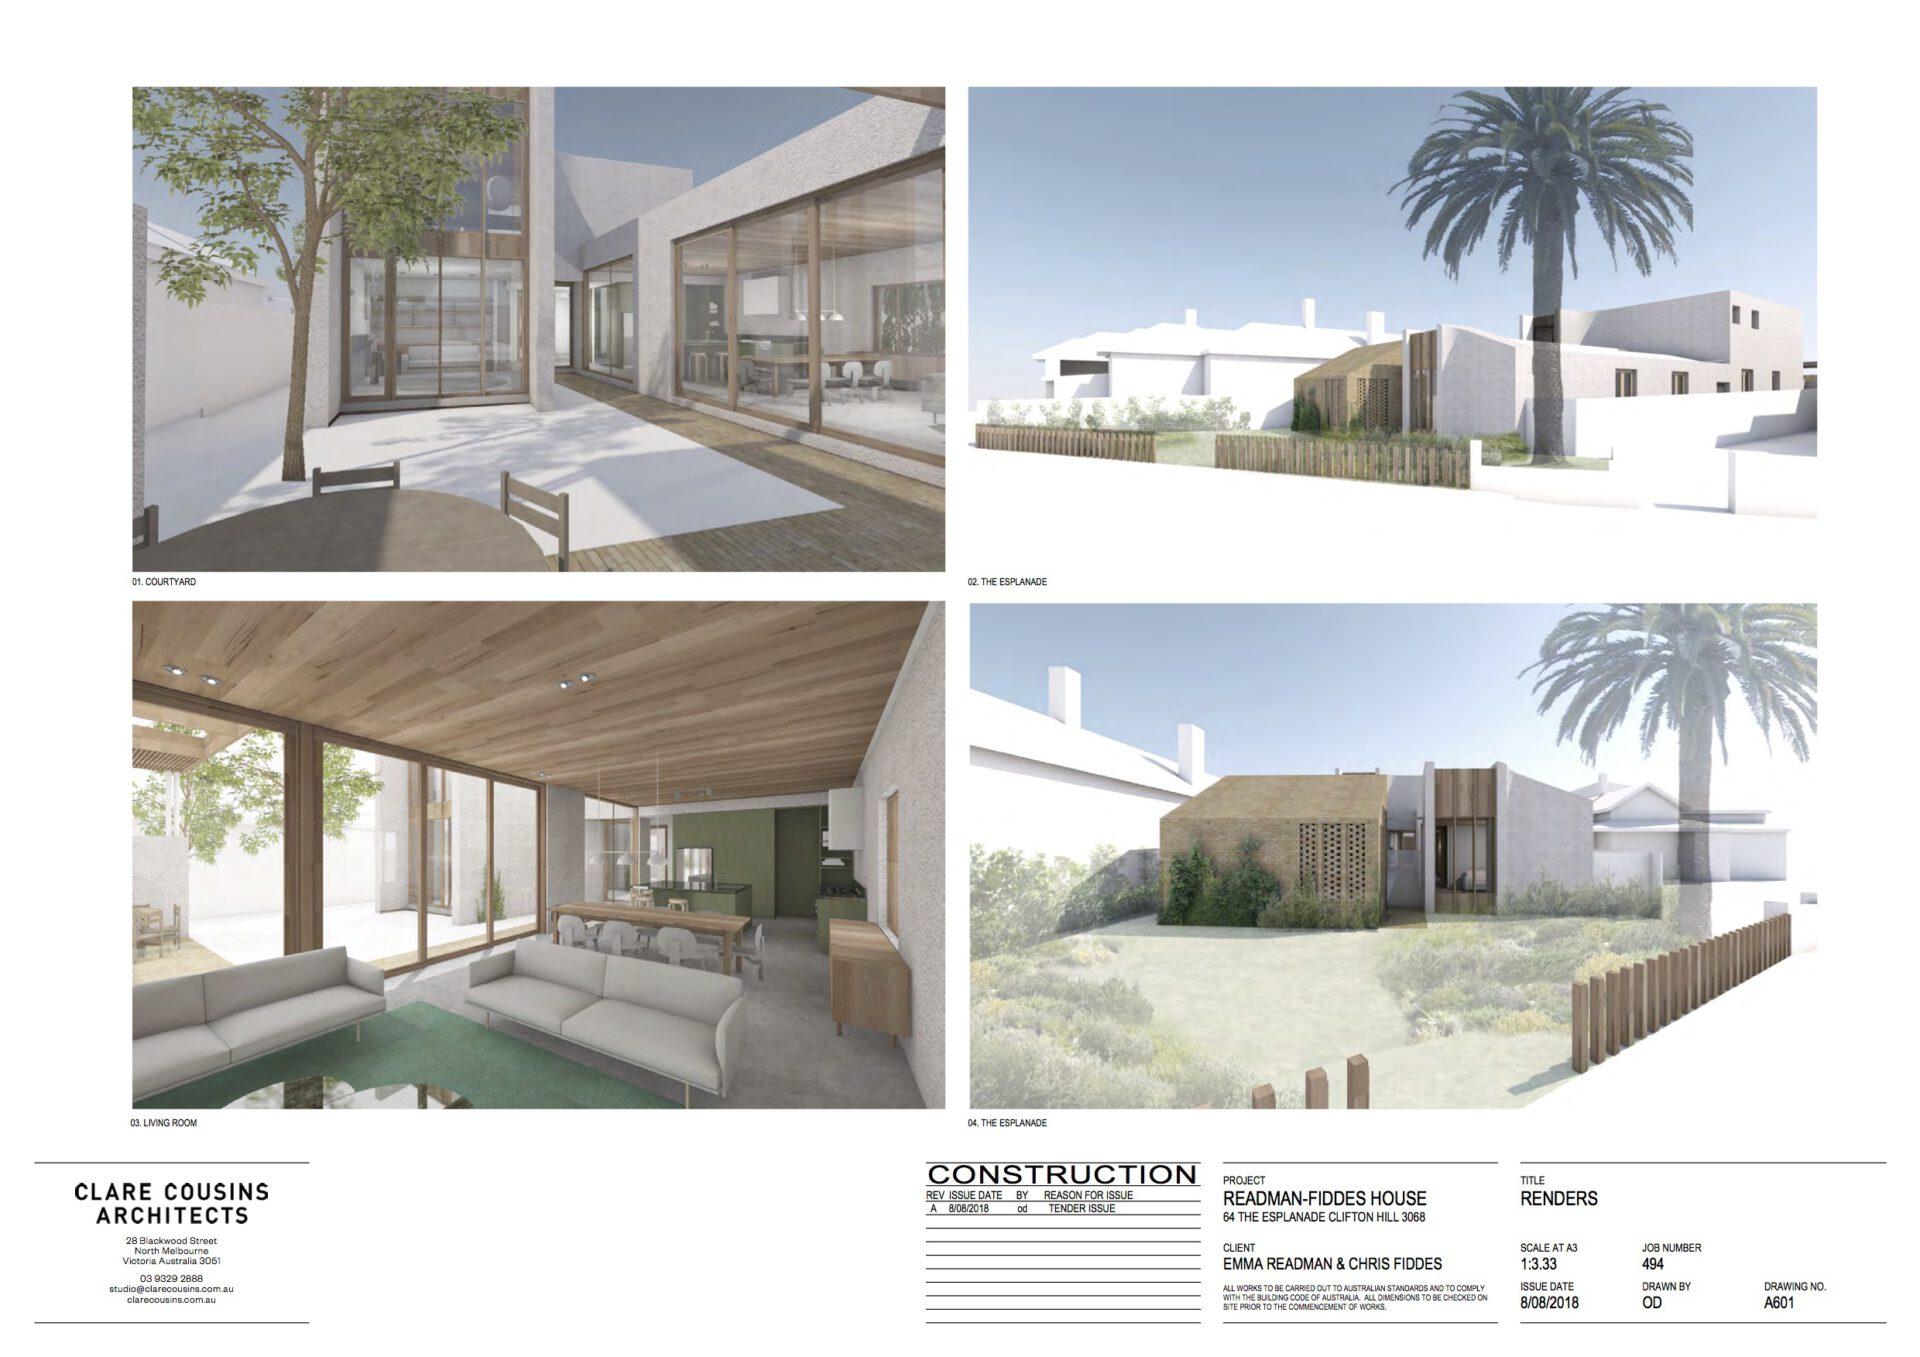 181115_Readman-Fiddes House_For Construction